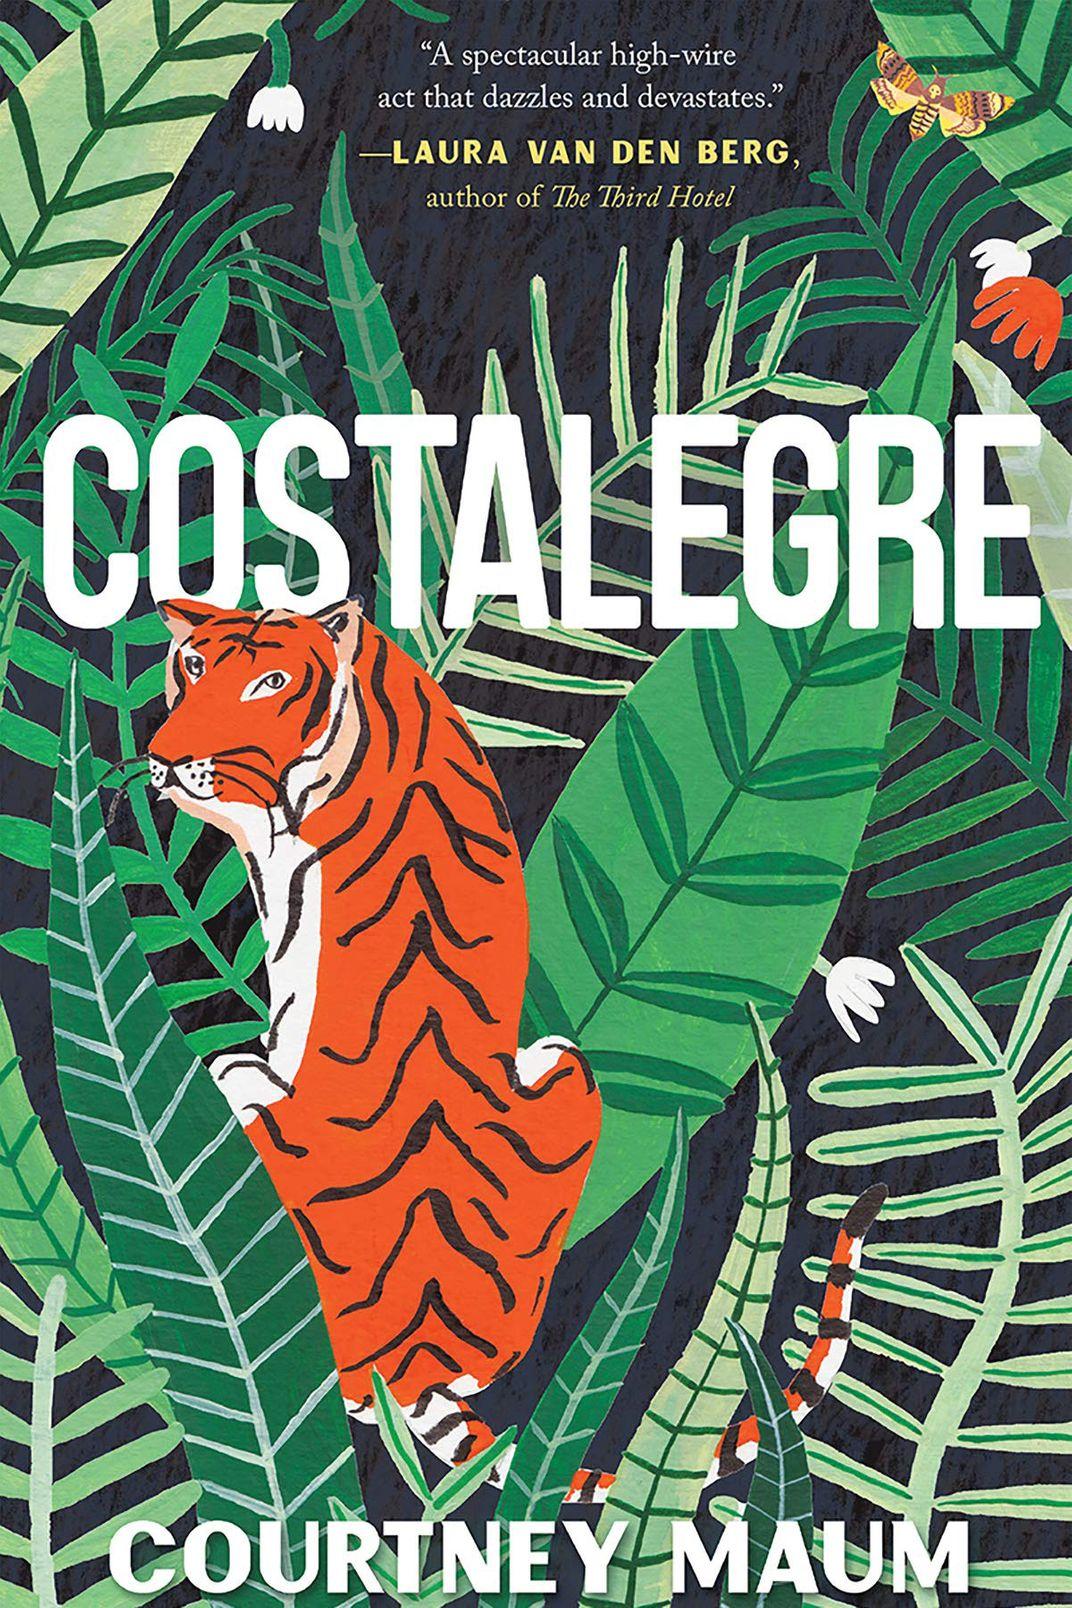 Costalegre, by Courtney Maum (Tin House, July 22)